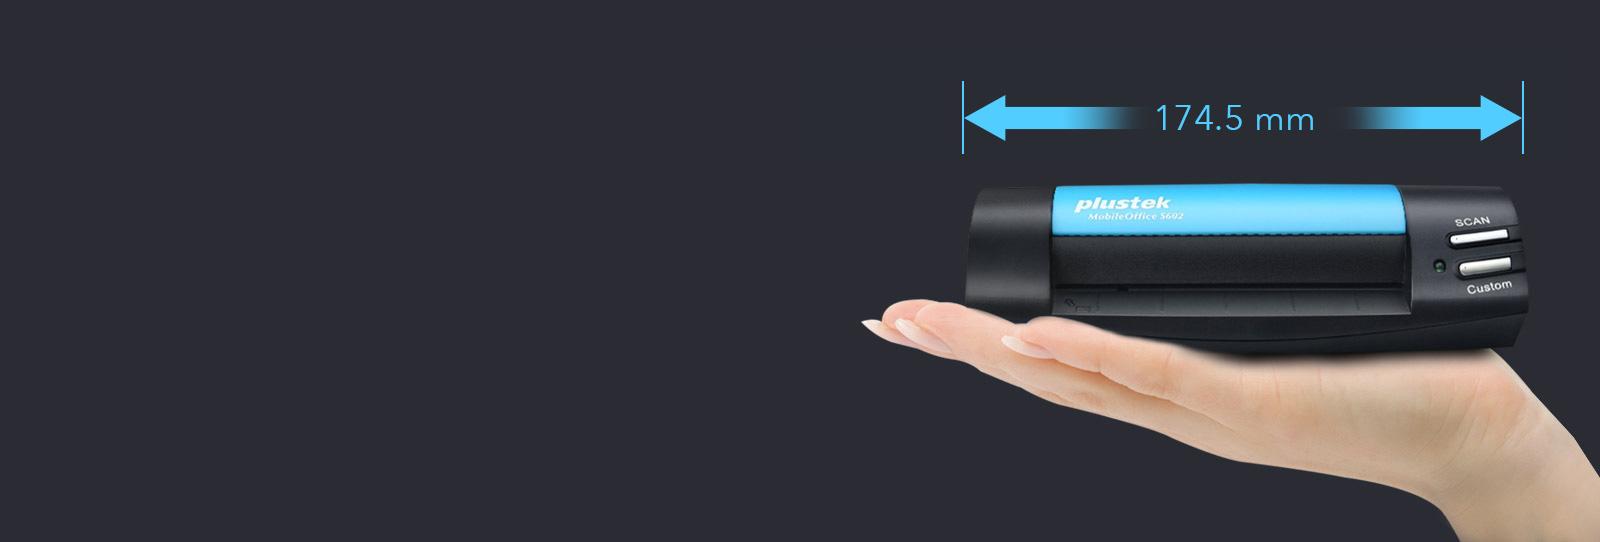 The highest resolution portable scanner ever